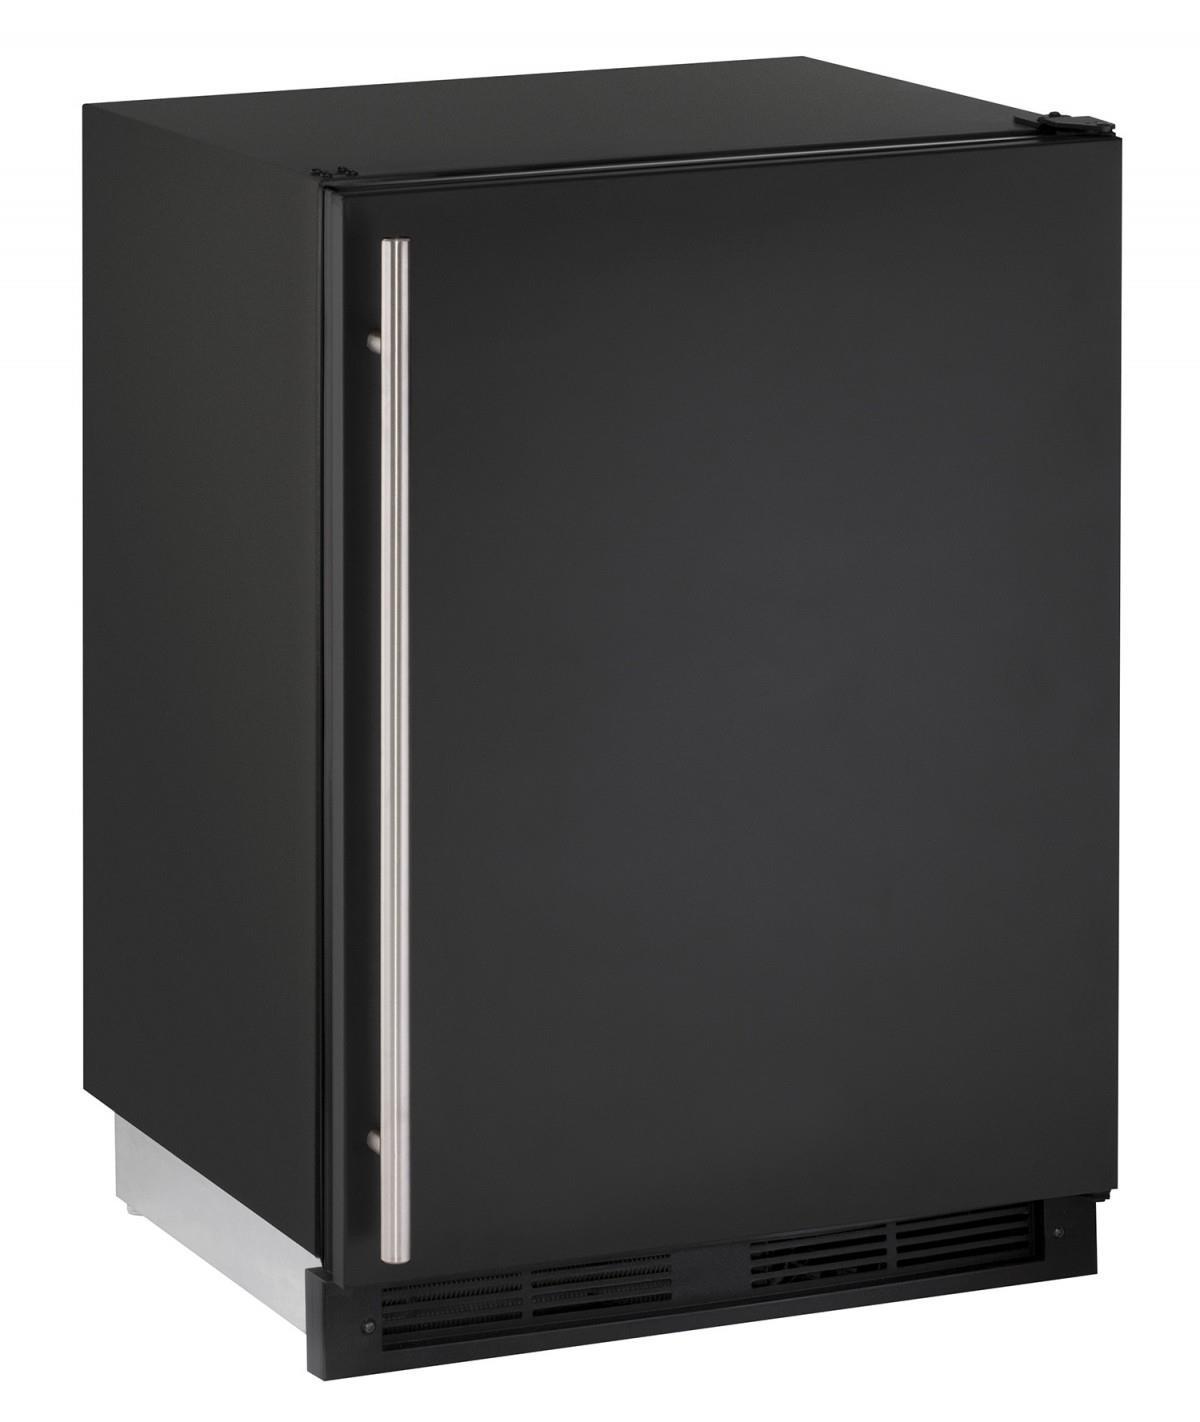 U-Line Refrigerators 4.2 cu. ft. Built-in Refrigerator/Freezer - Item Number: U-CO1224FB-00A